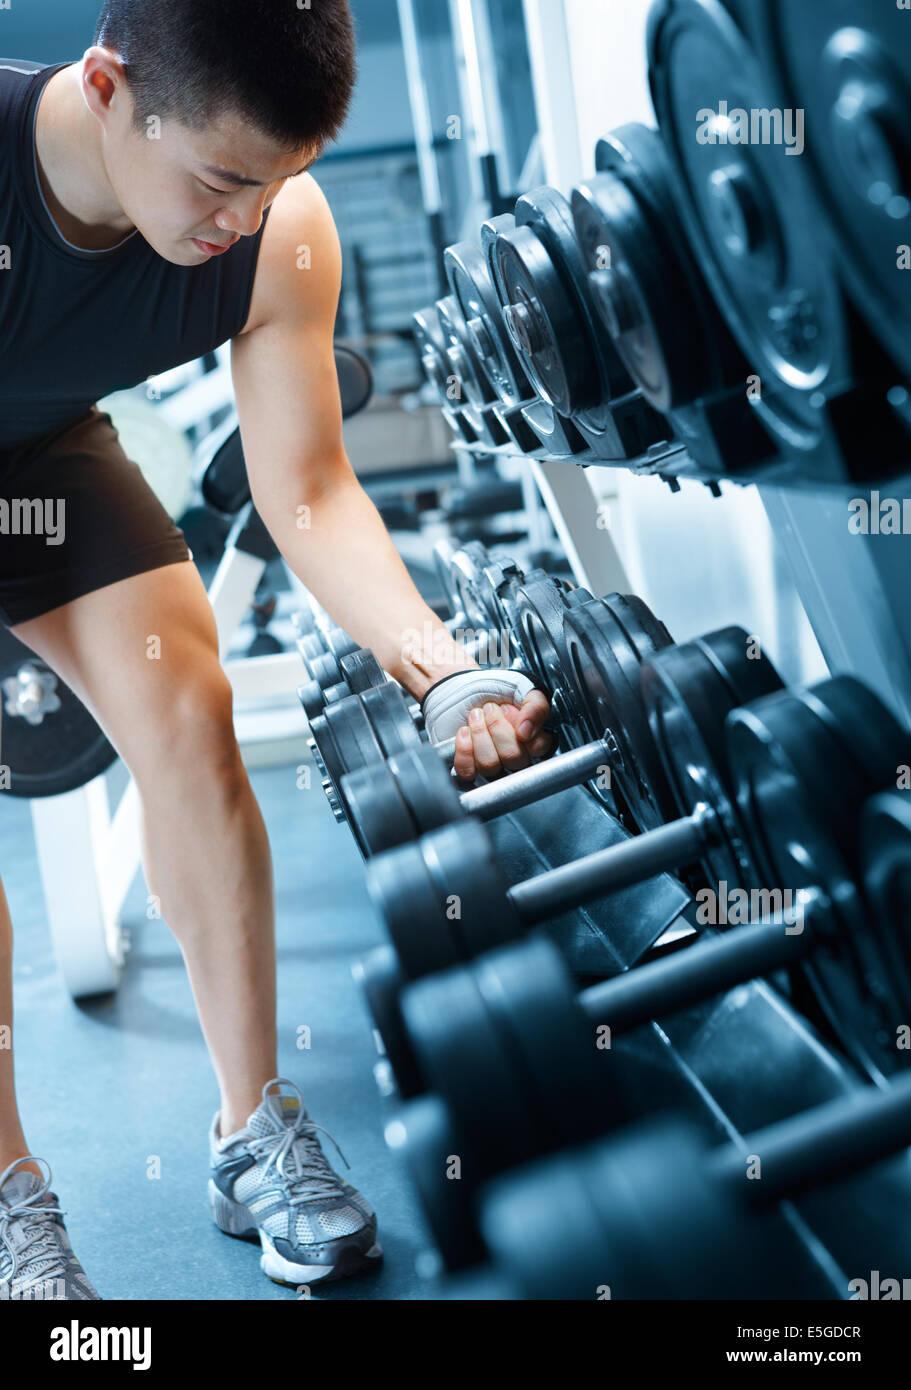 asian man choosing dumbbell in health club - Stock Image